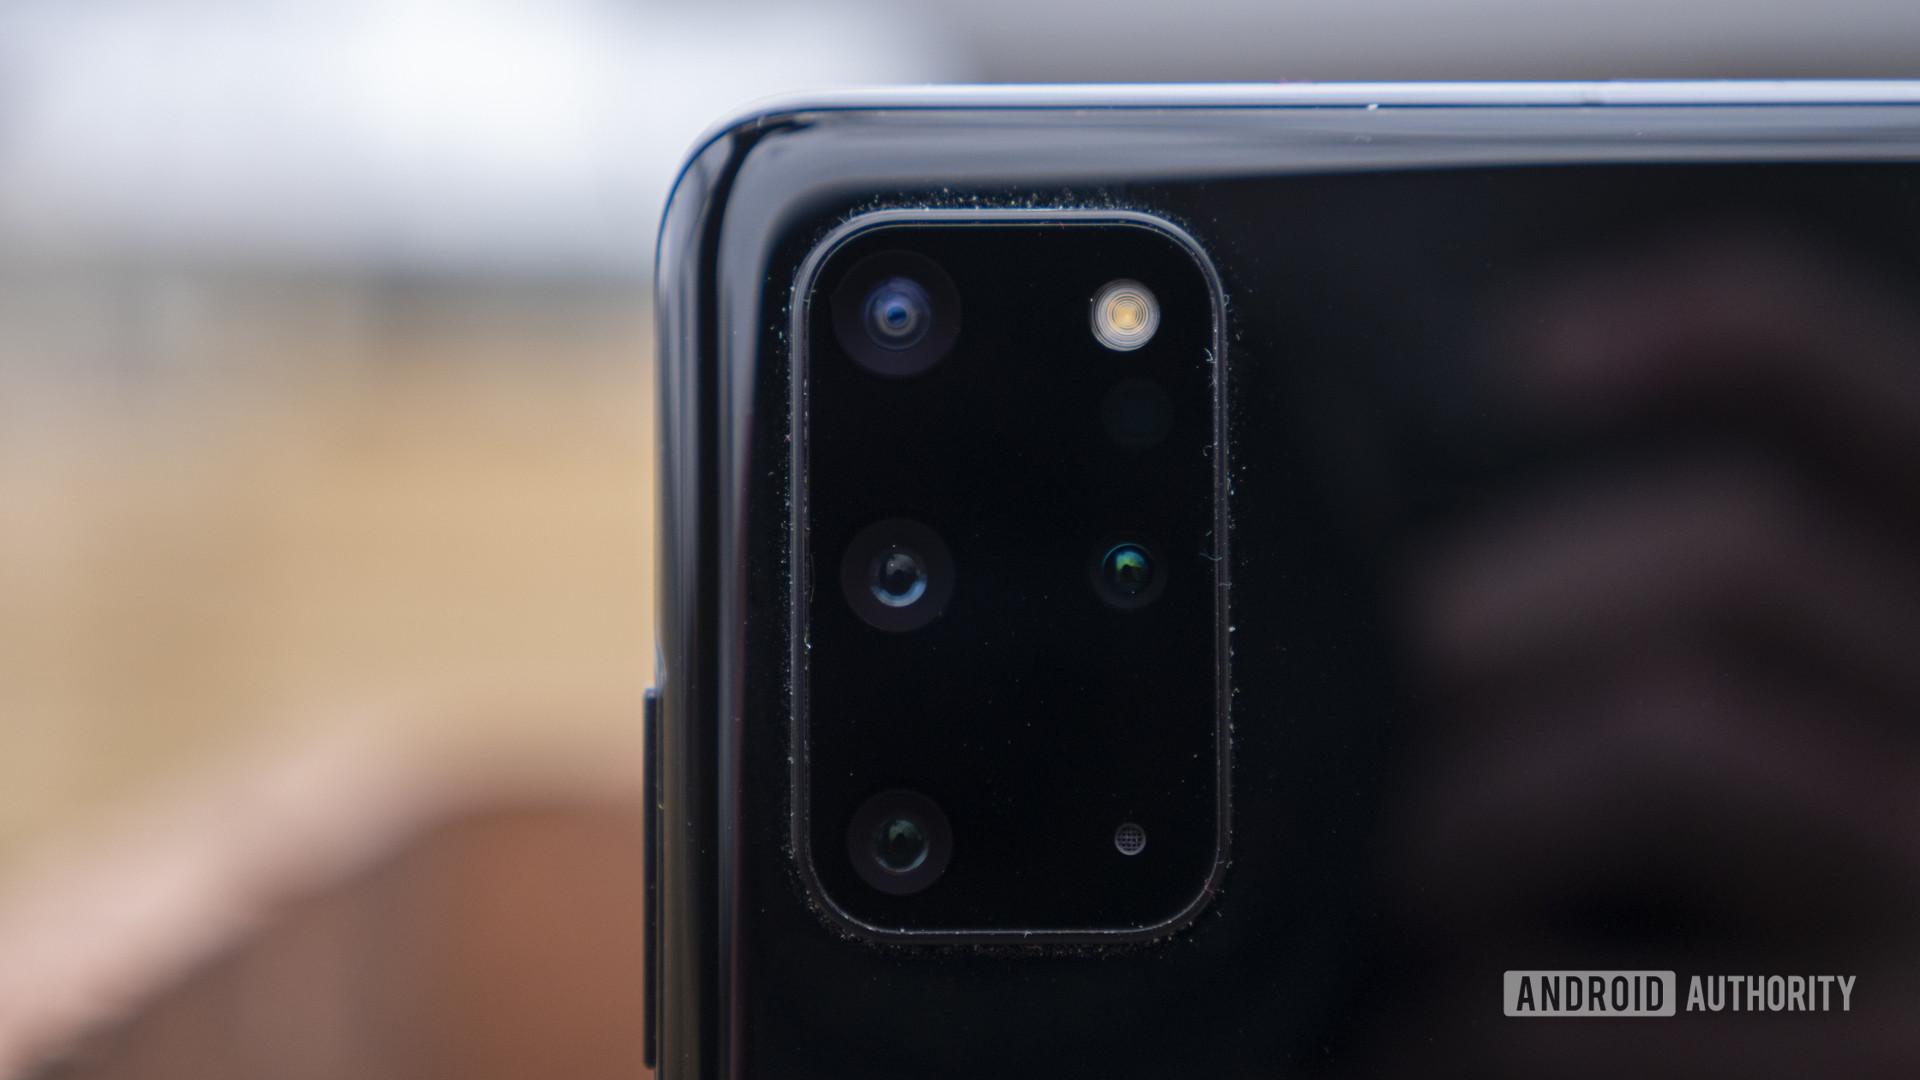 samsung galaxy s20 plus review rear cameras close up 1